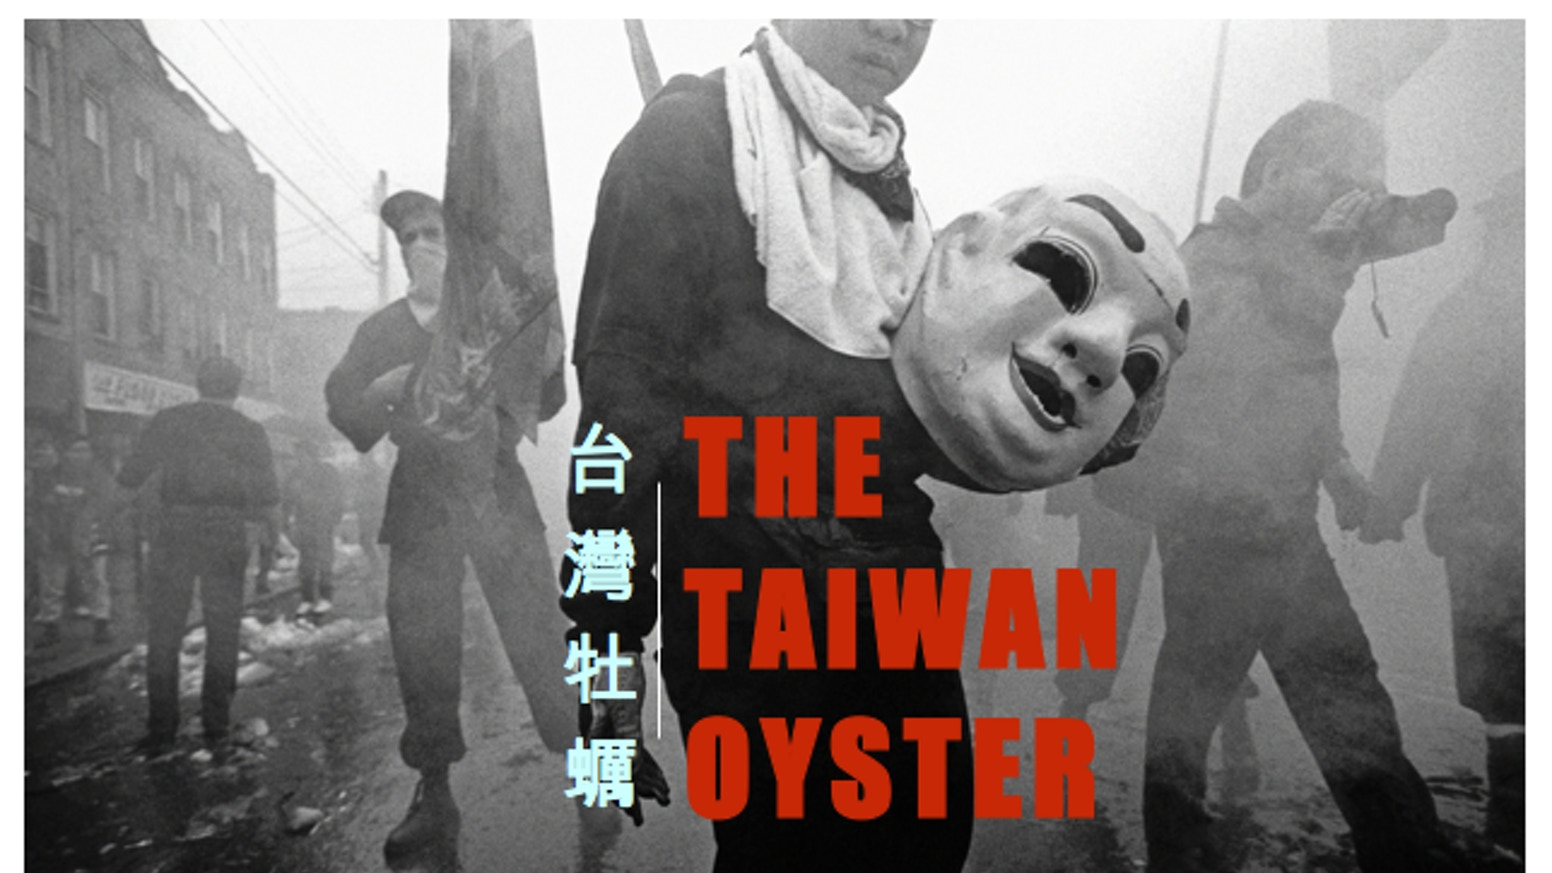 Two Ex-Pat Kindergarten teachers in Taiwan embark on a quixotic odyssey to bury a fellow countryman.